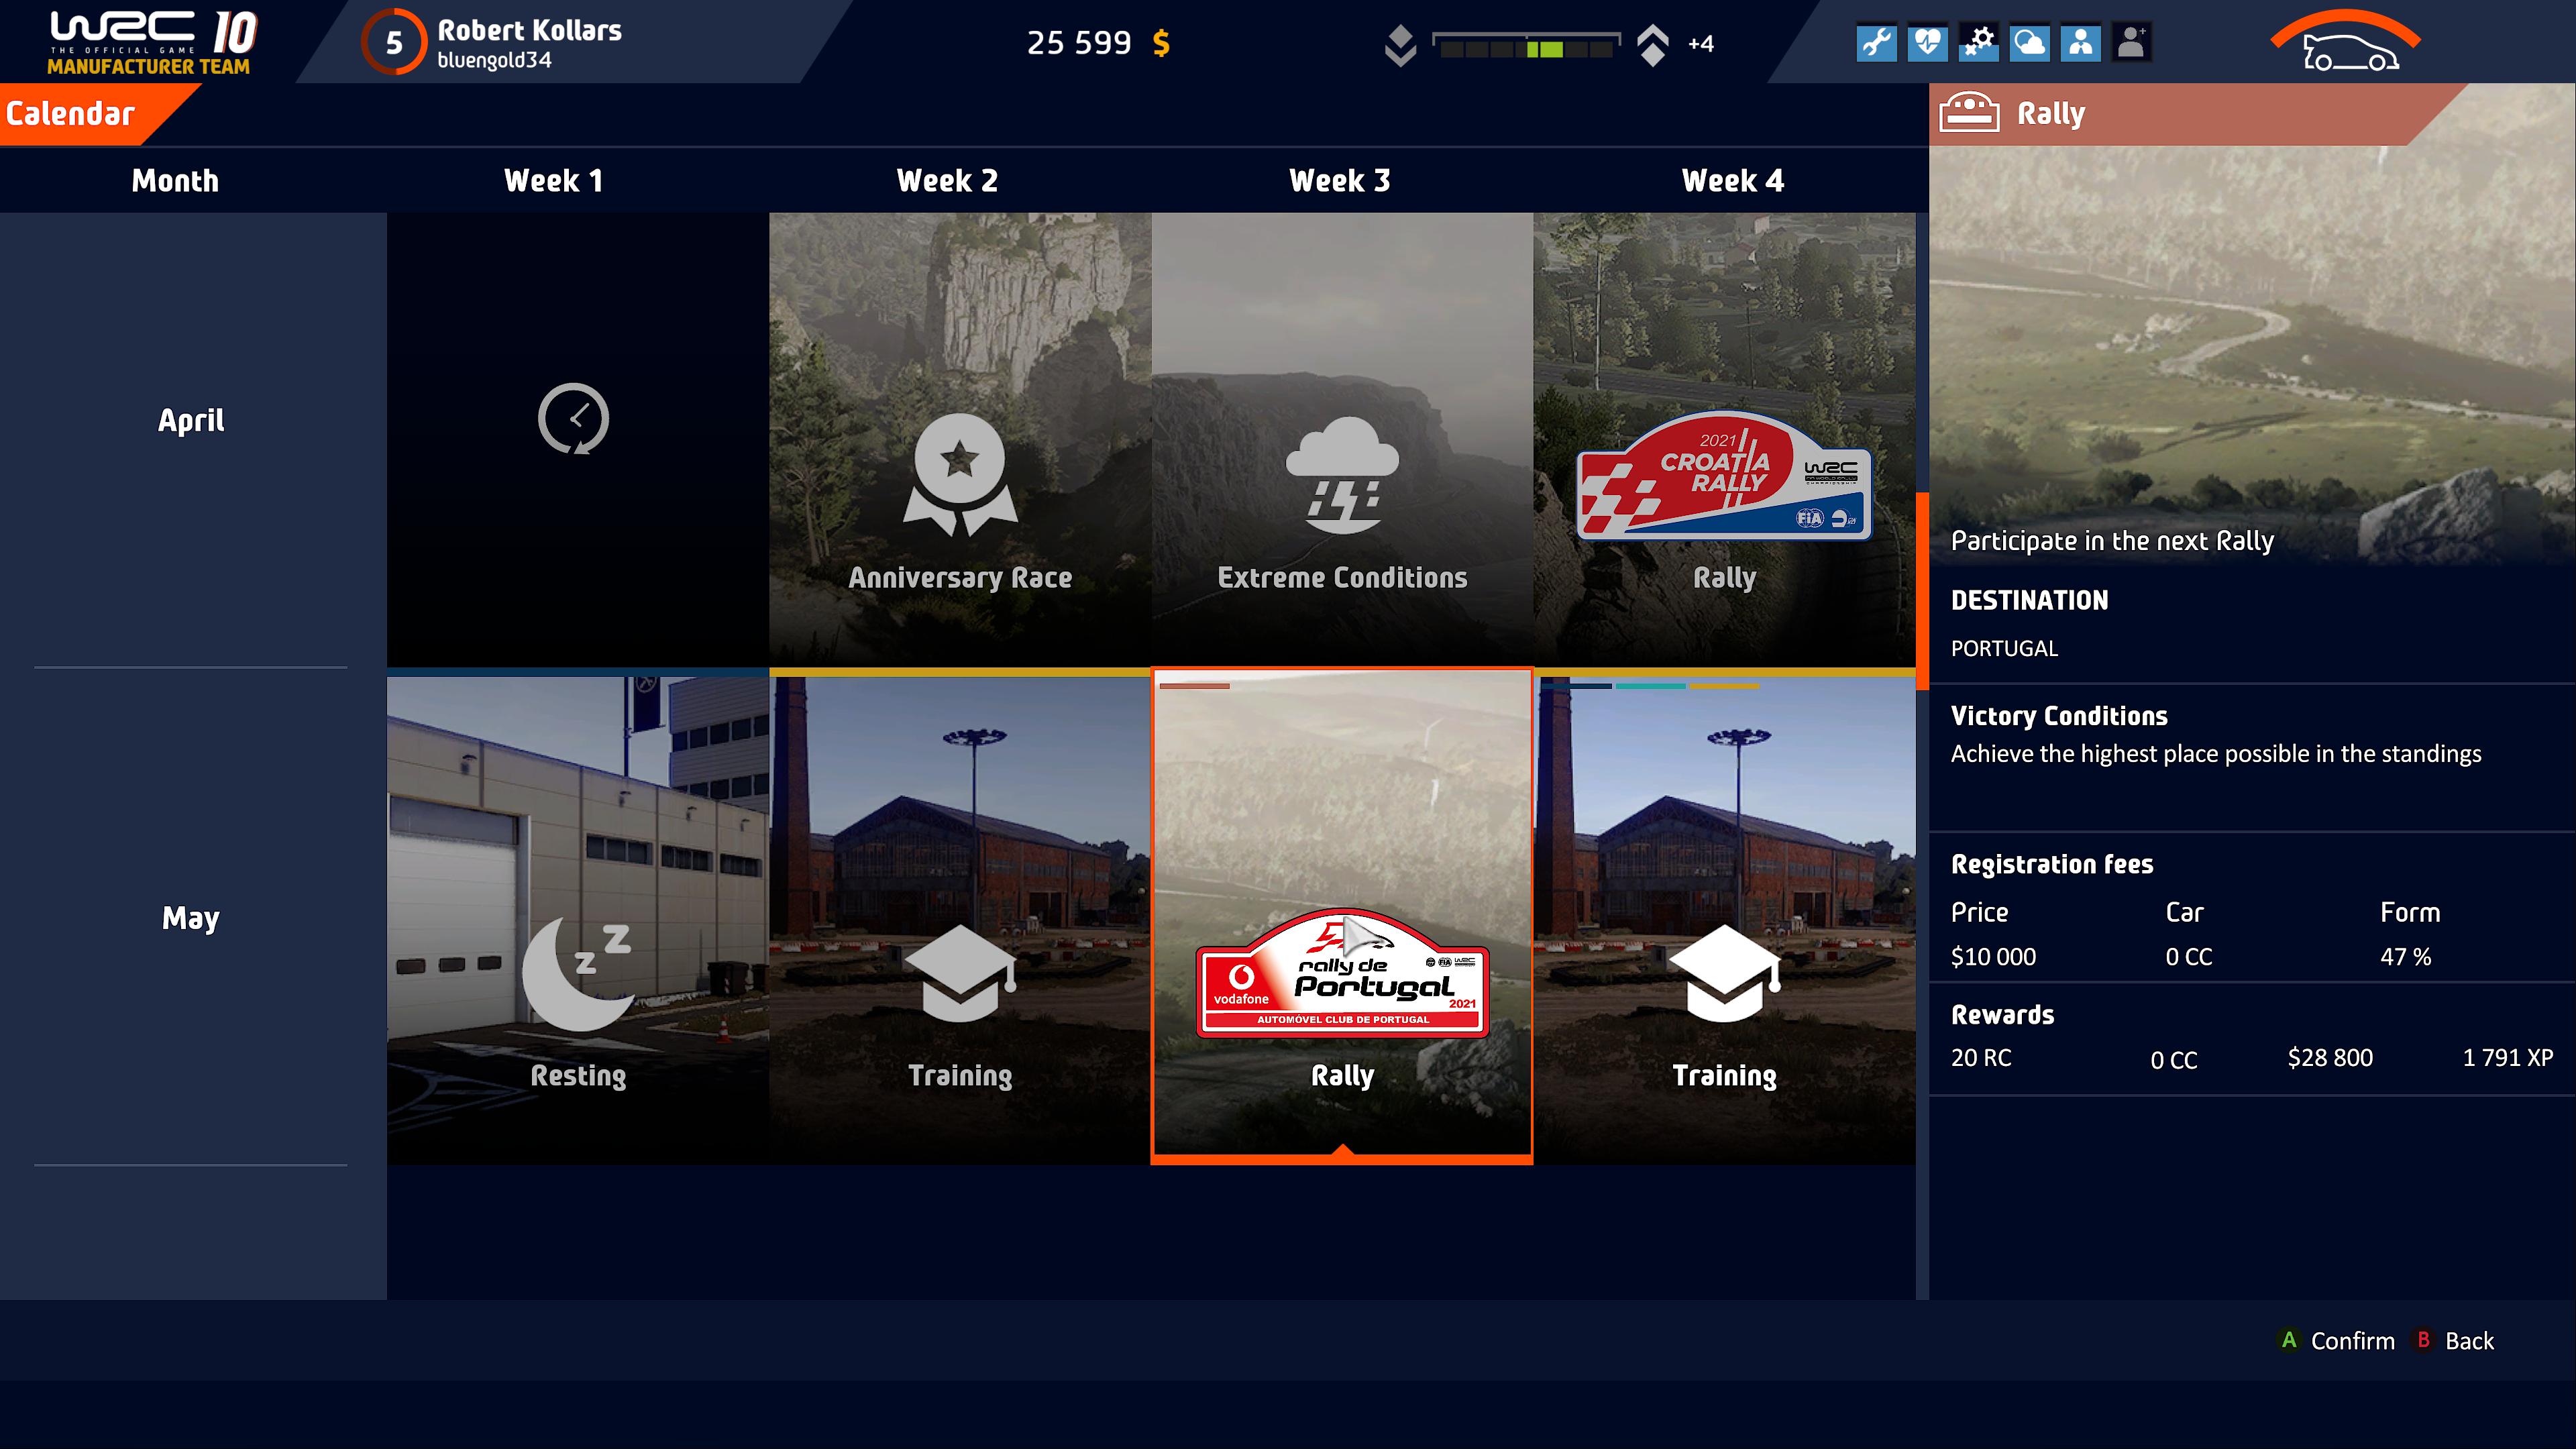 Wrc 10 Fia World Rally Championship Screenshot 2021.08.29 - 15.51.49.66